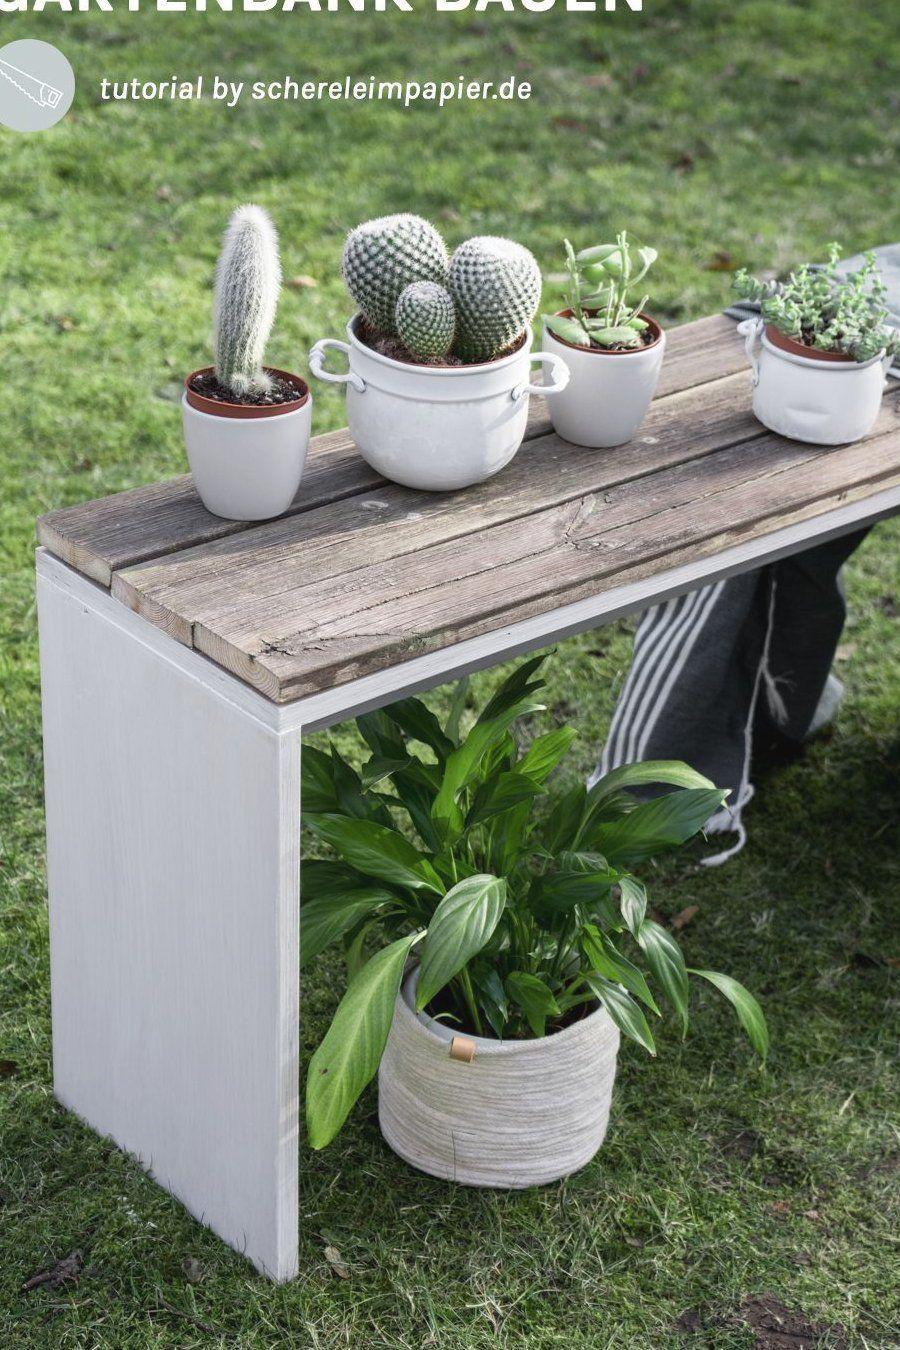 Diy Garten Mobel Diy Gartenbank Mit Altholz Bauen Upcycling Projekt Diy Wohnen Ideen Fur Den In 2020 Diy Garden Furniture Garden Bench Diy Terrace Garden Design